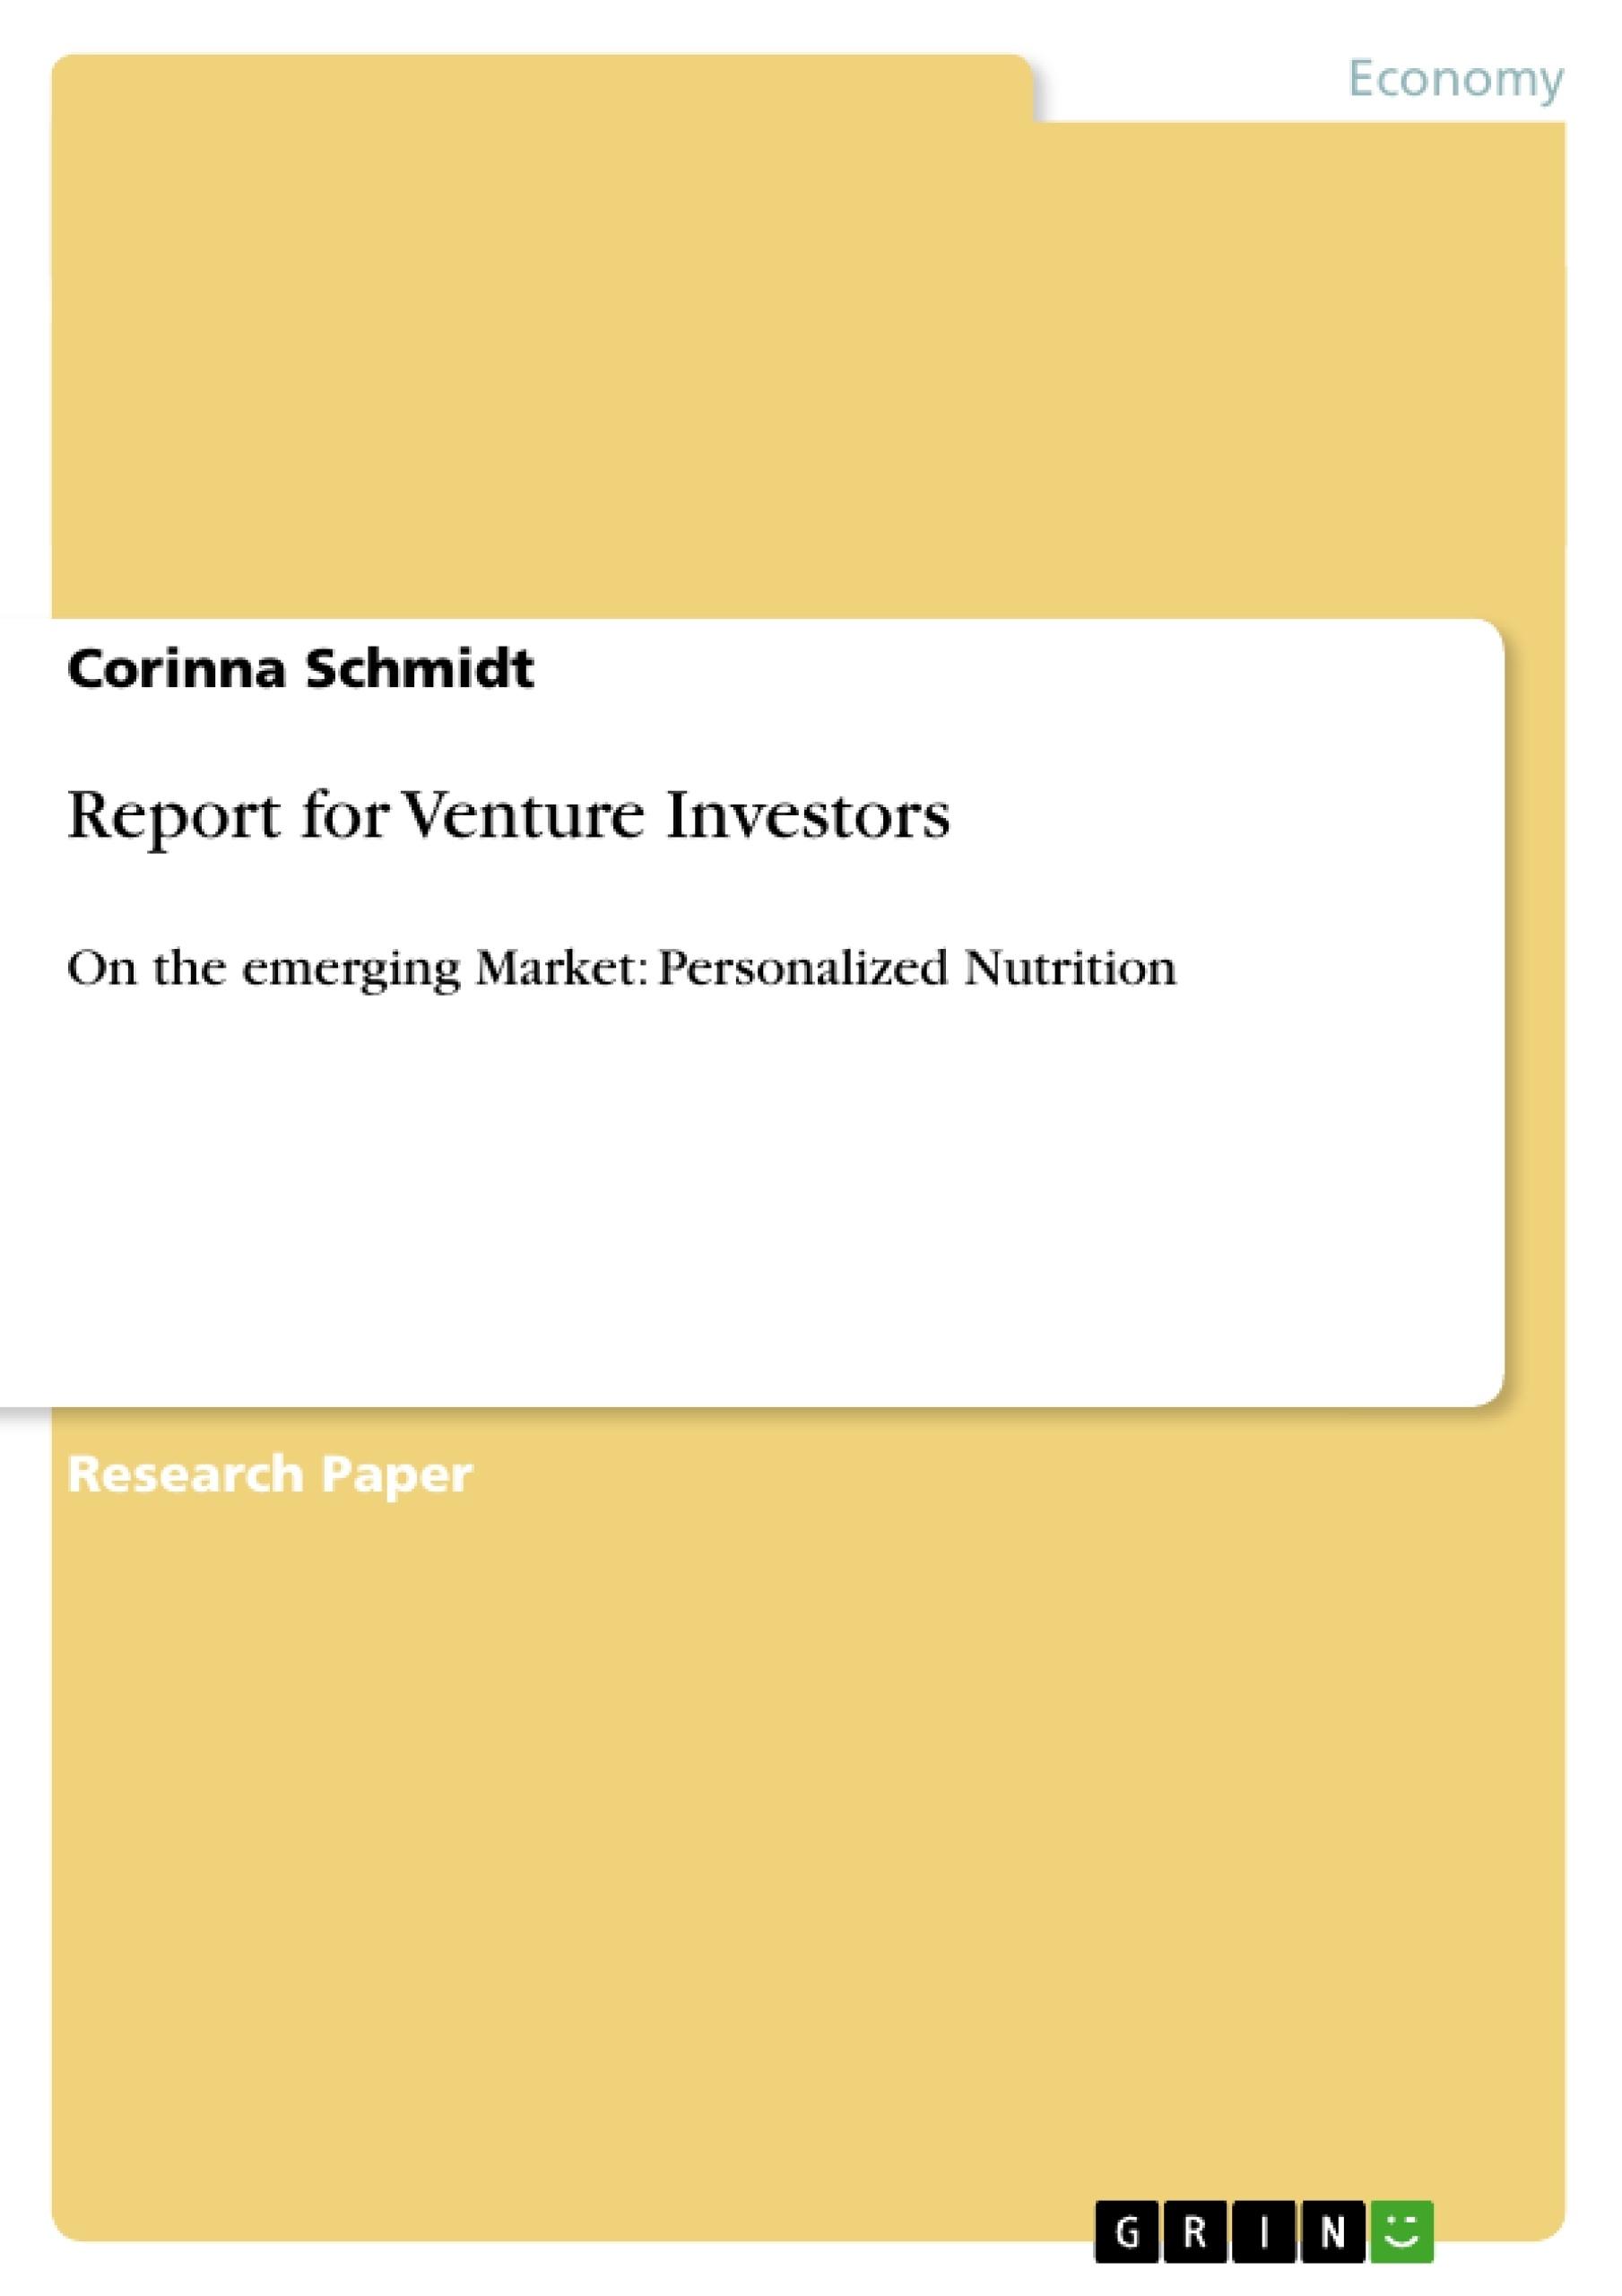 Title: Report for Venture Investors